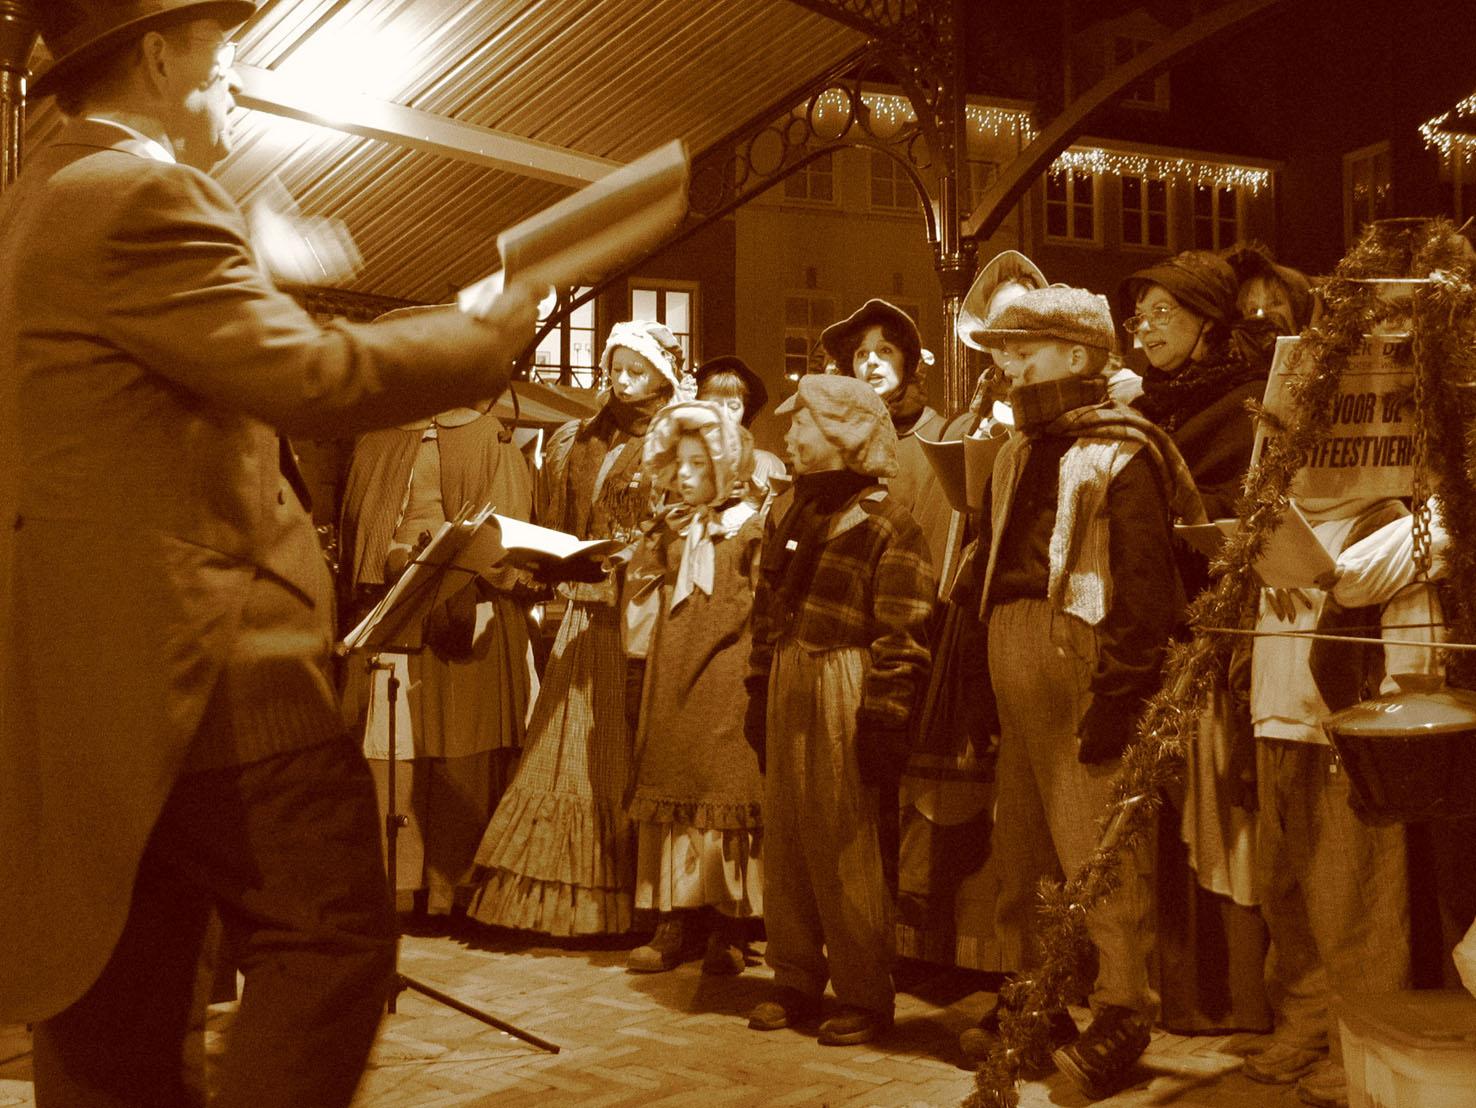 166 - Kerstmarkt Helmond 2003.jpg